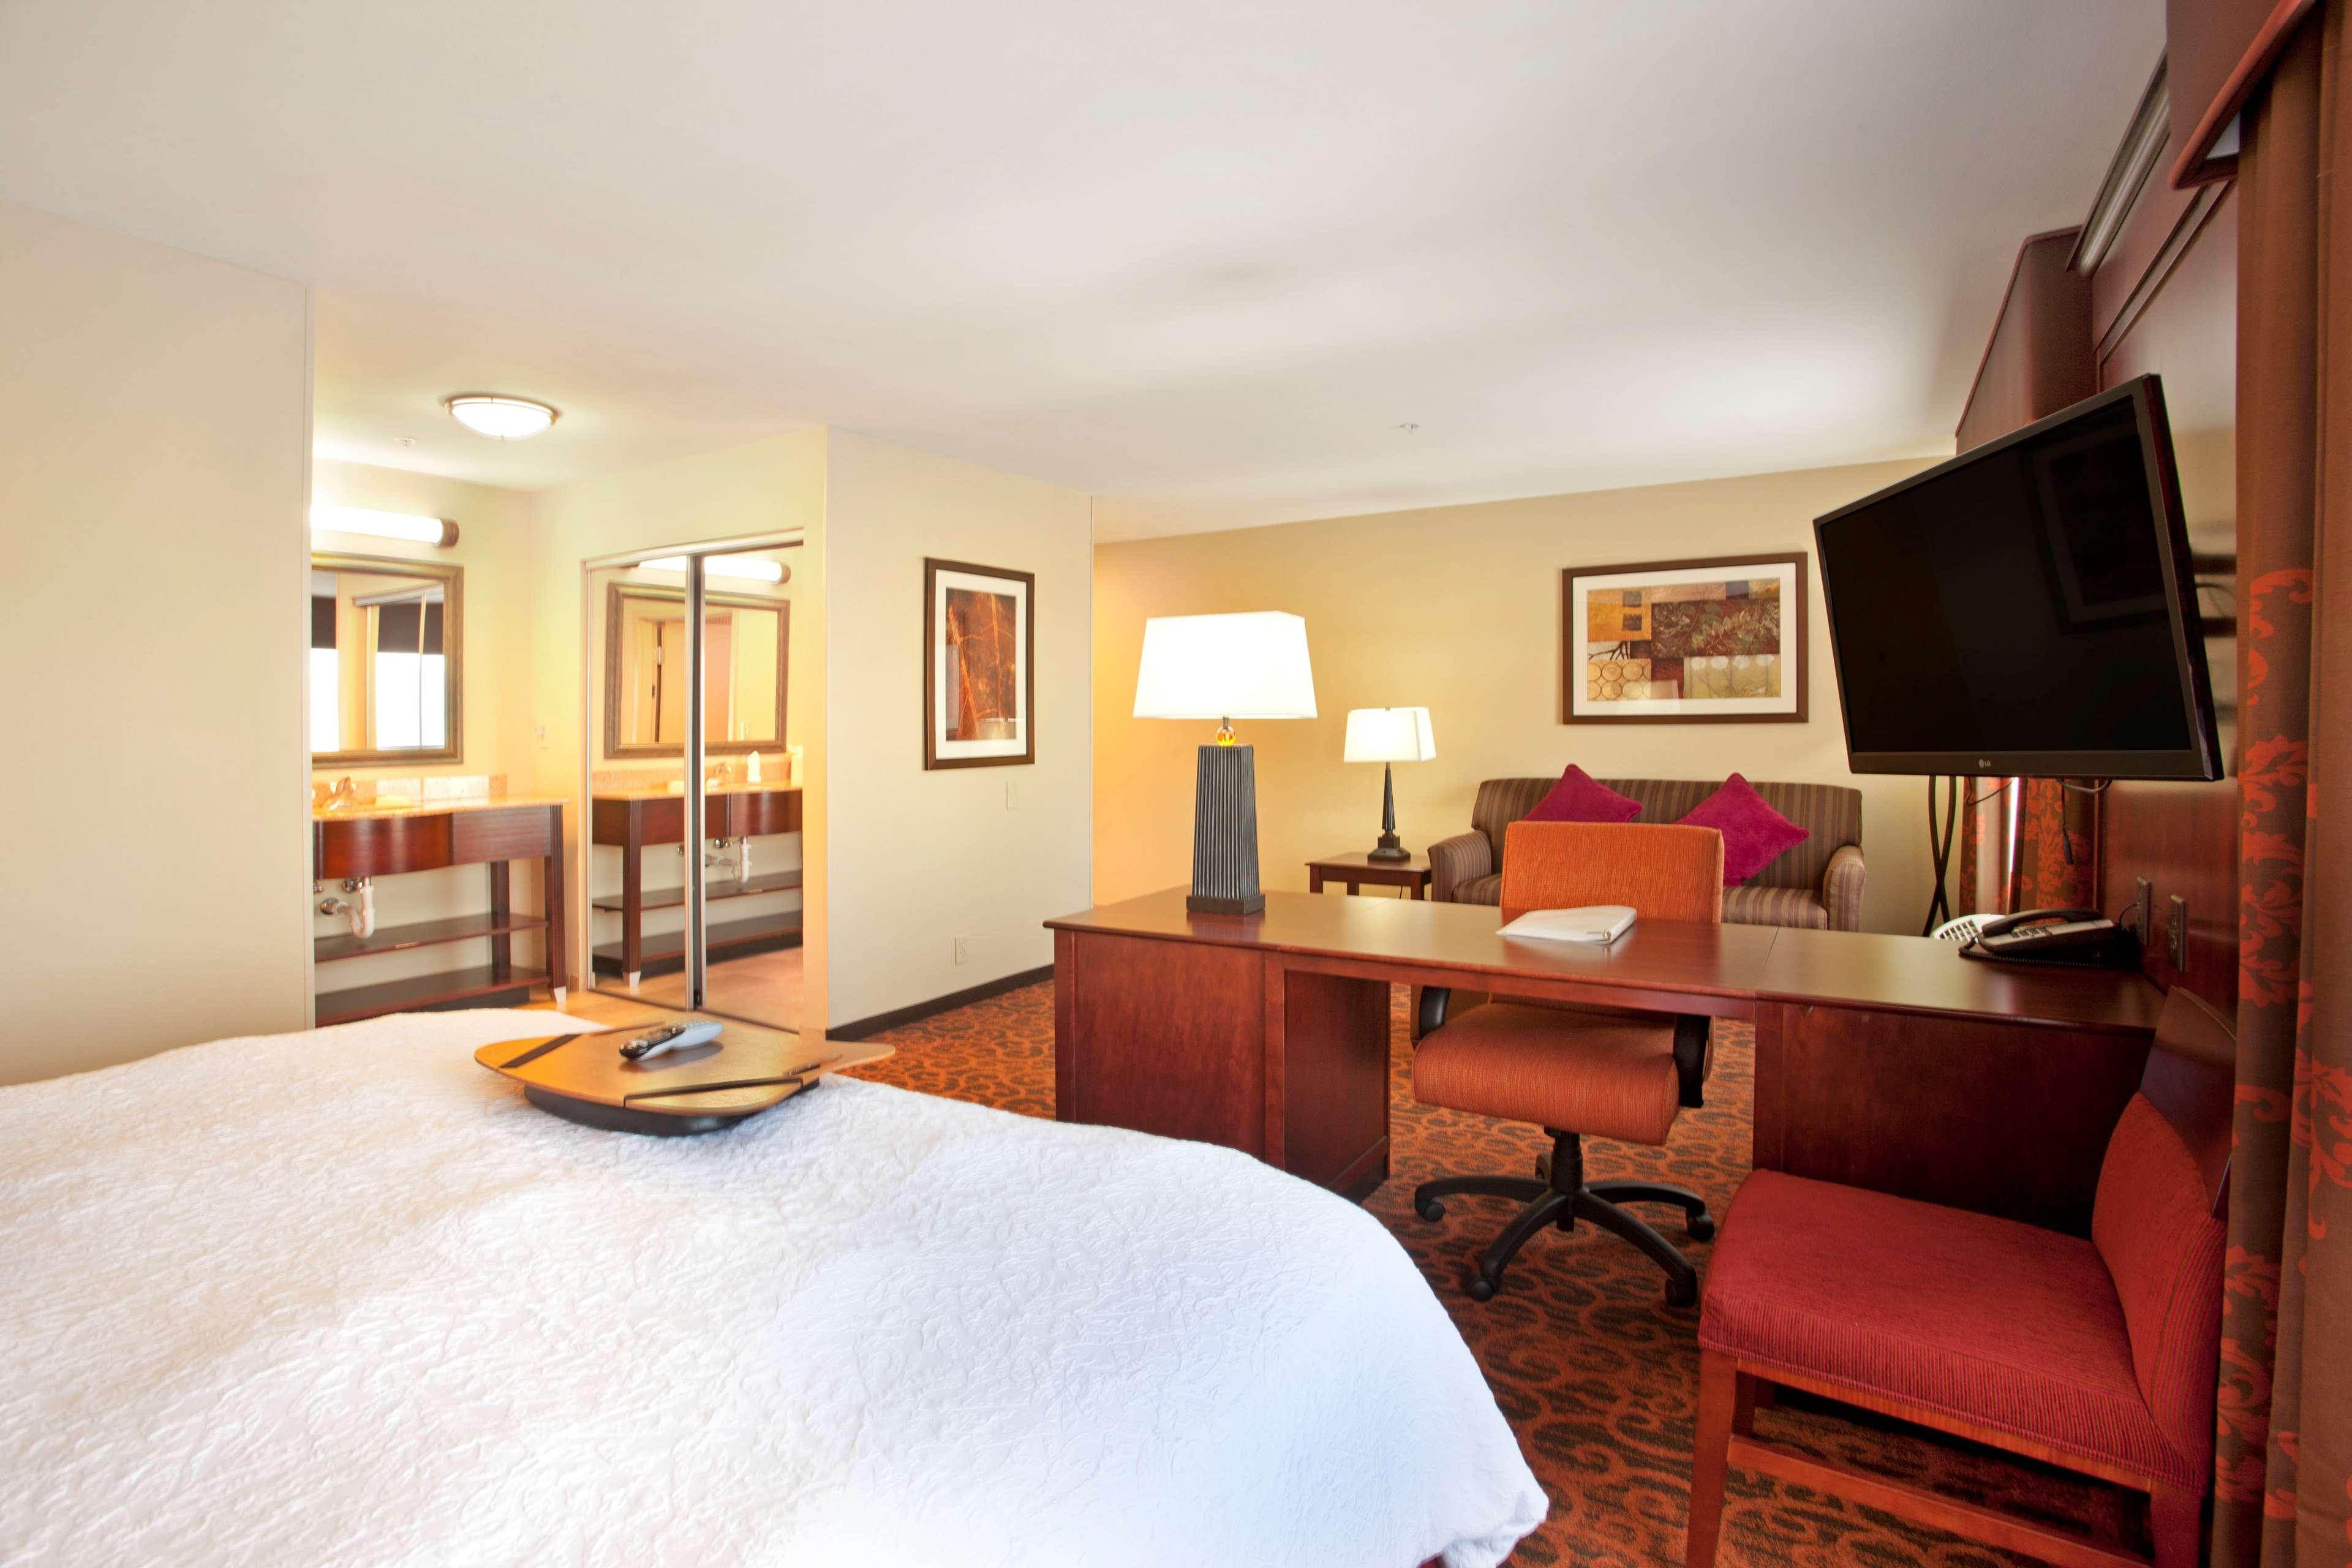 Hampton Inn & Suites Fort Worth-West-I-30 image 15